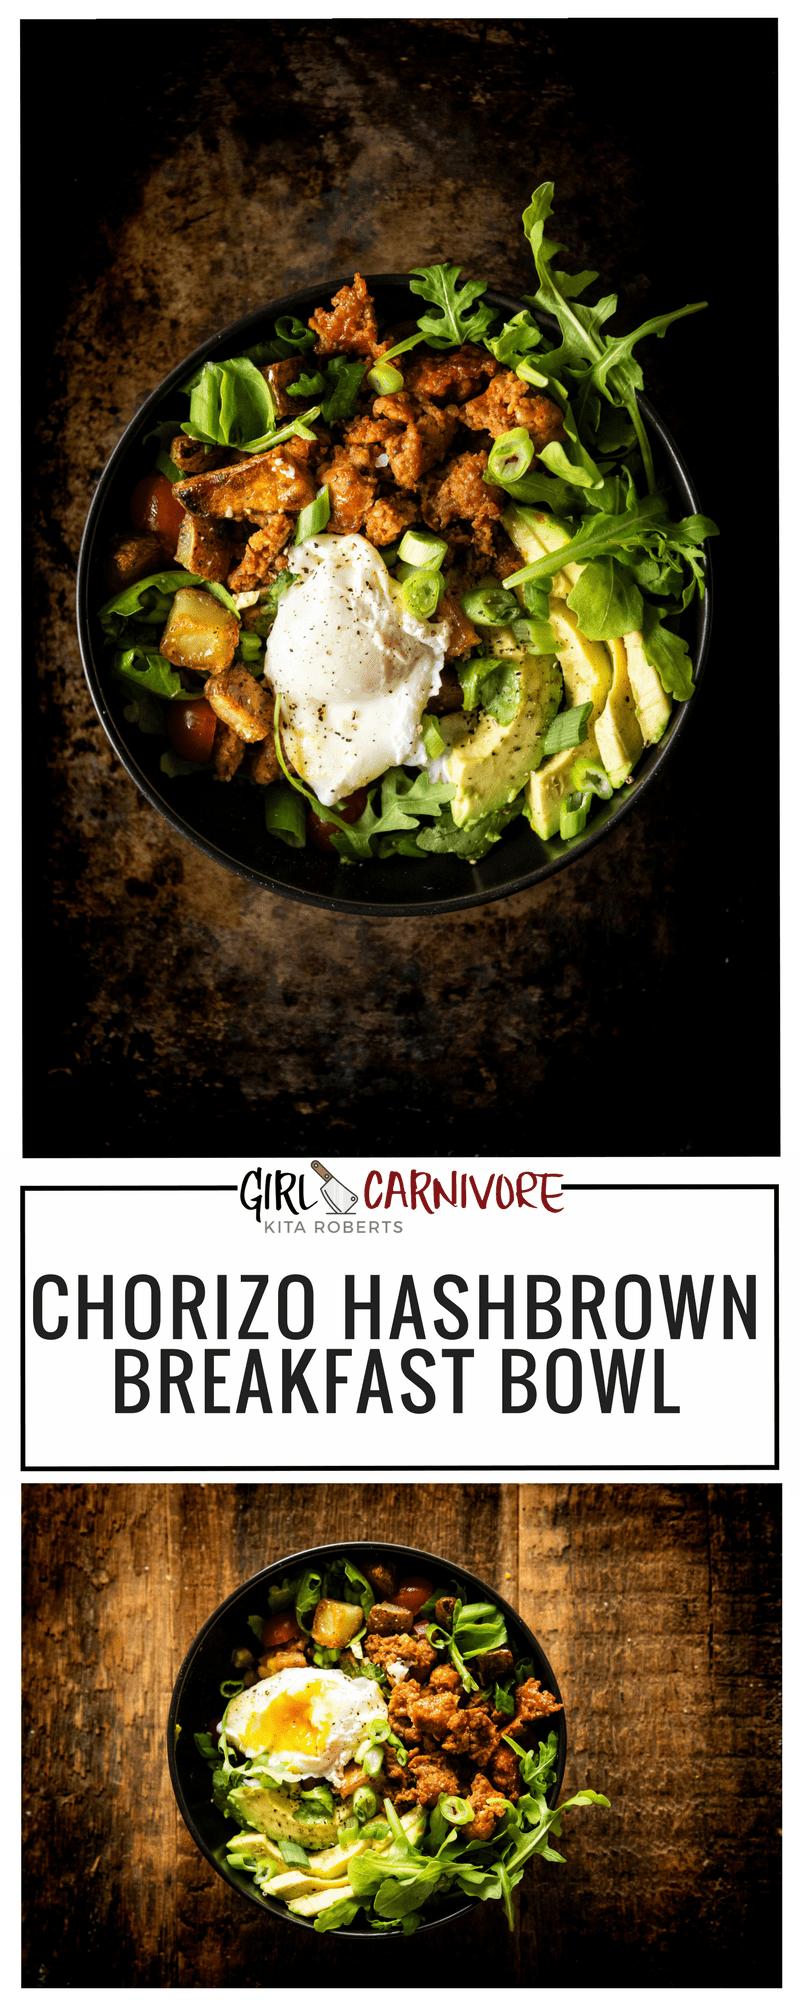 Chorizo Hash Breakfast Bowl with Chipotle Cream